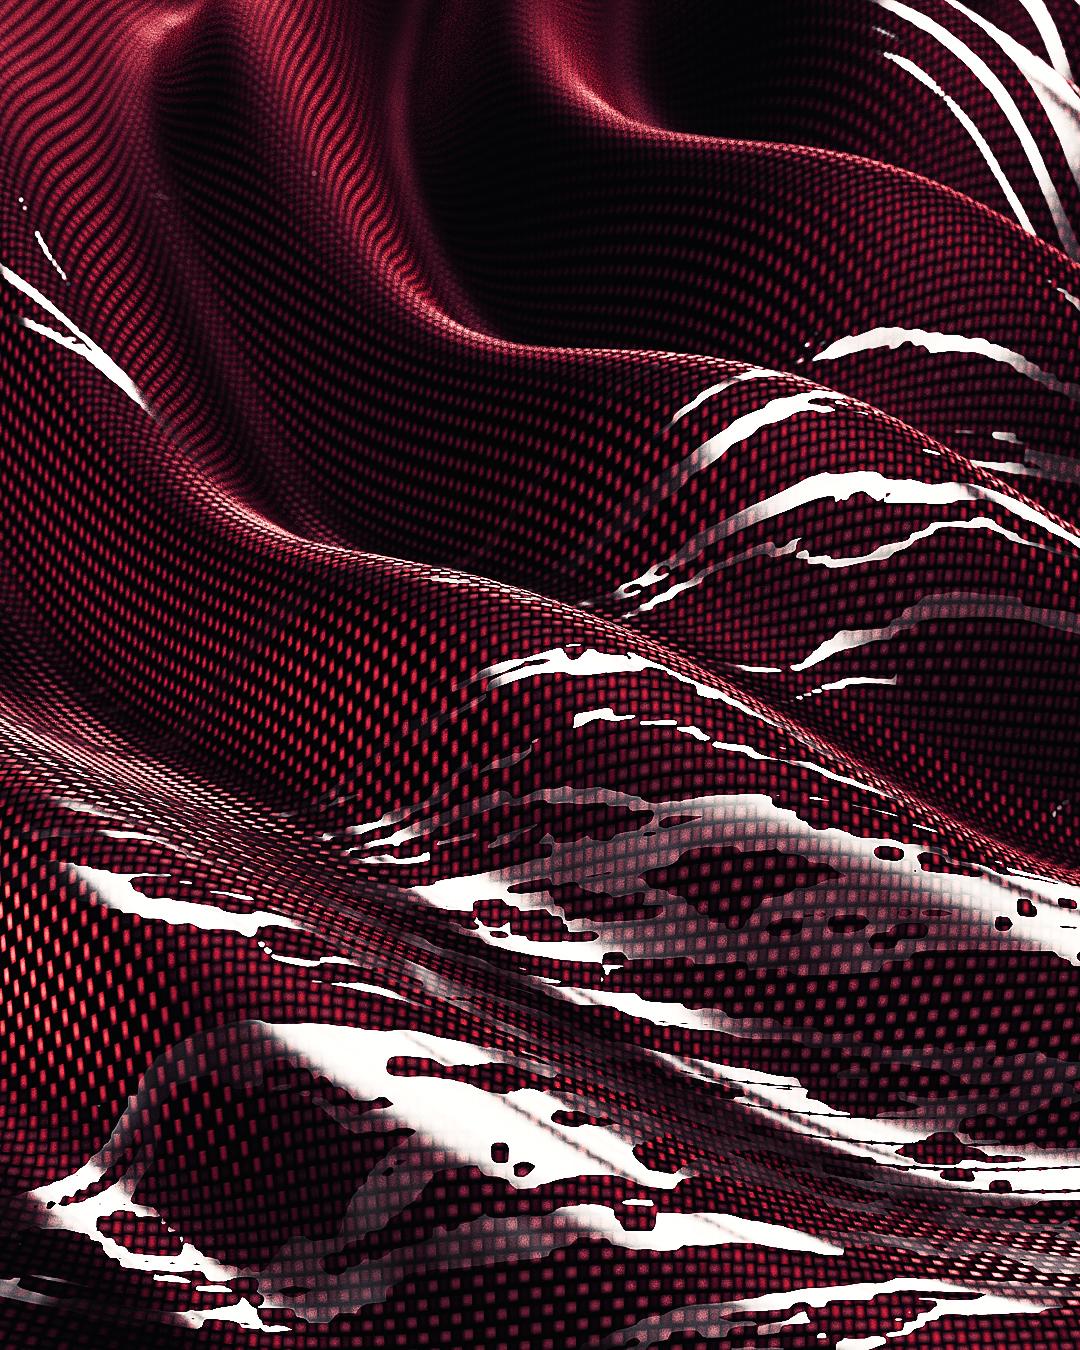 [19-03-17] - Textile.jpg